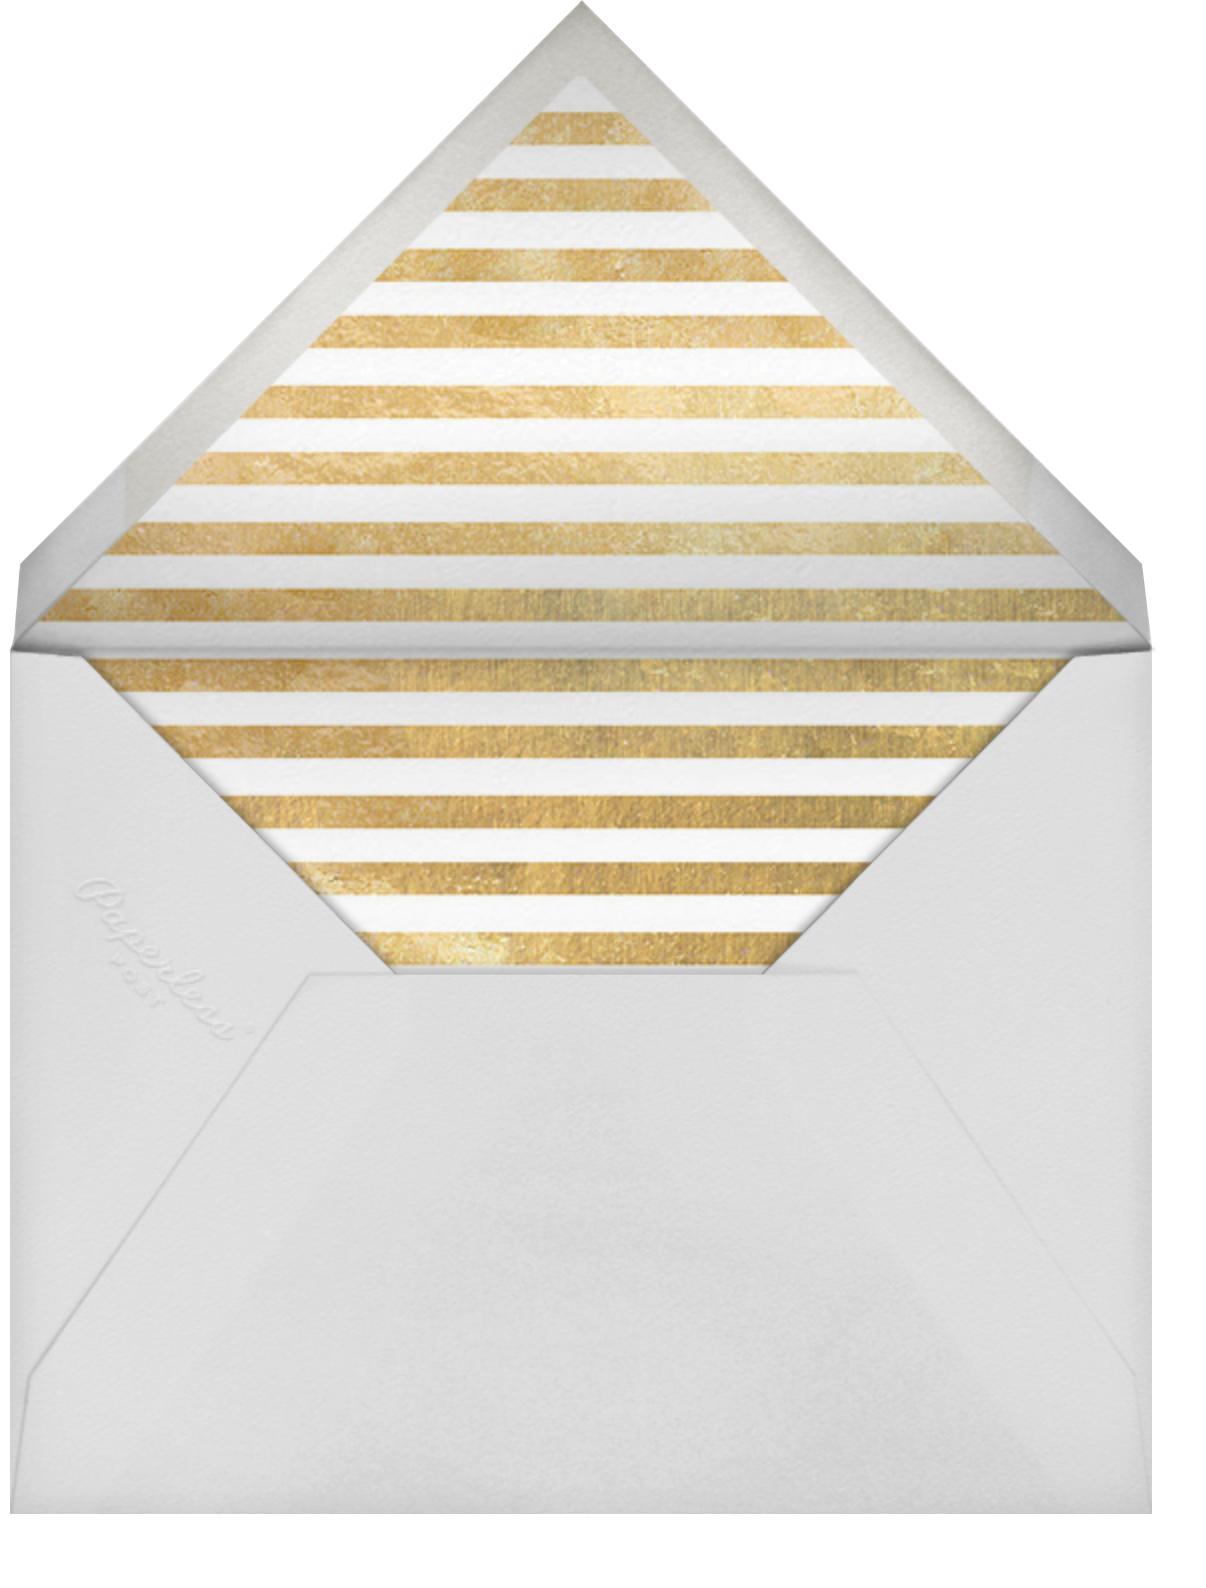 Confetti (Square) - Black - kate spade new york - General entertaining - envelope back